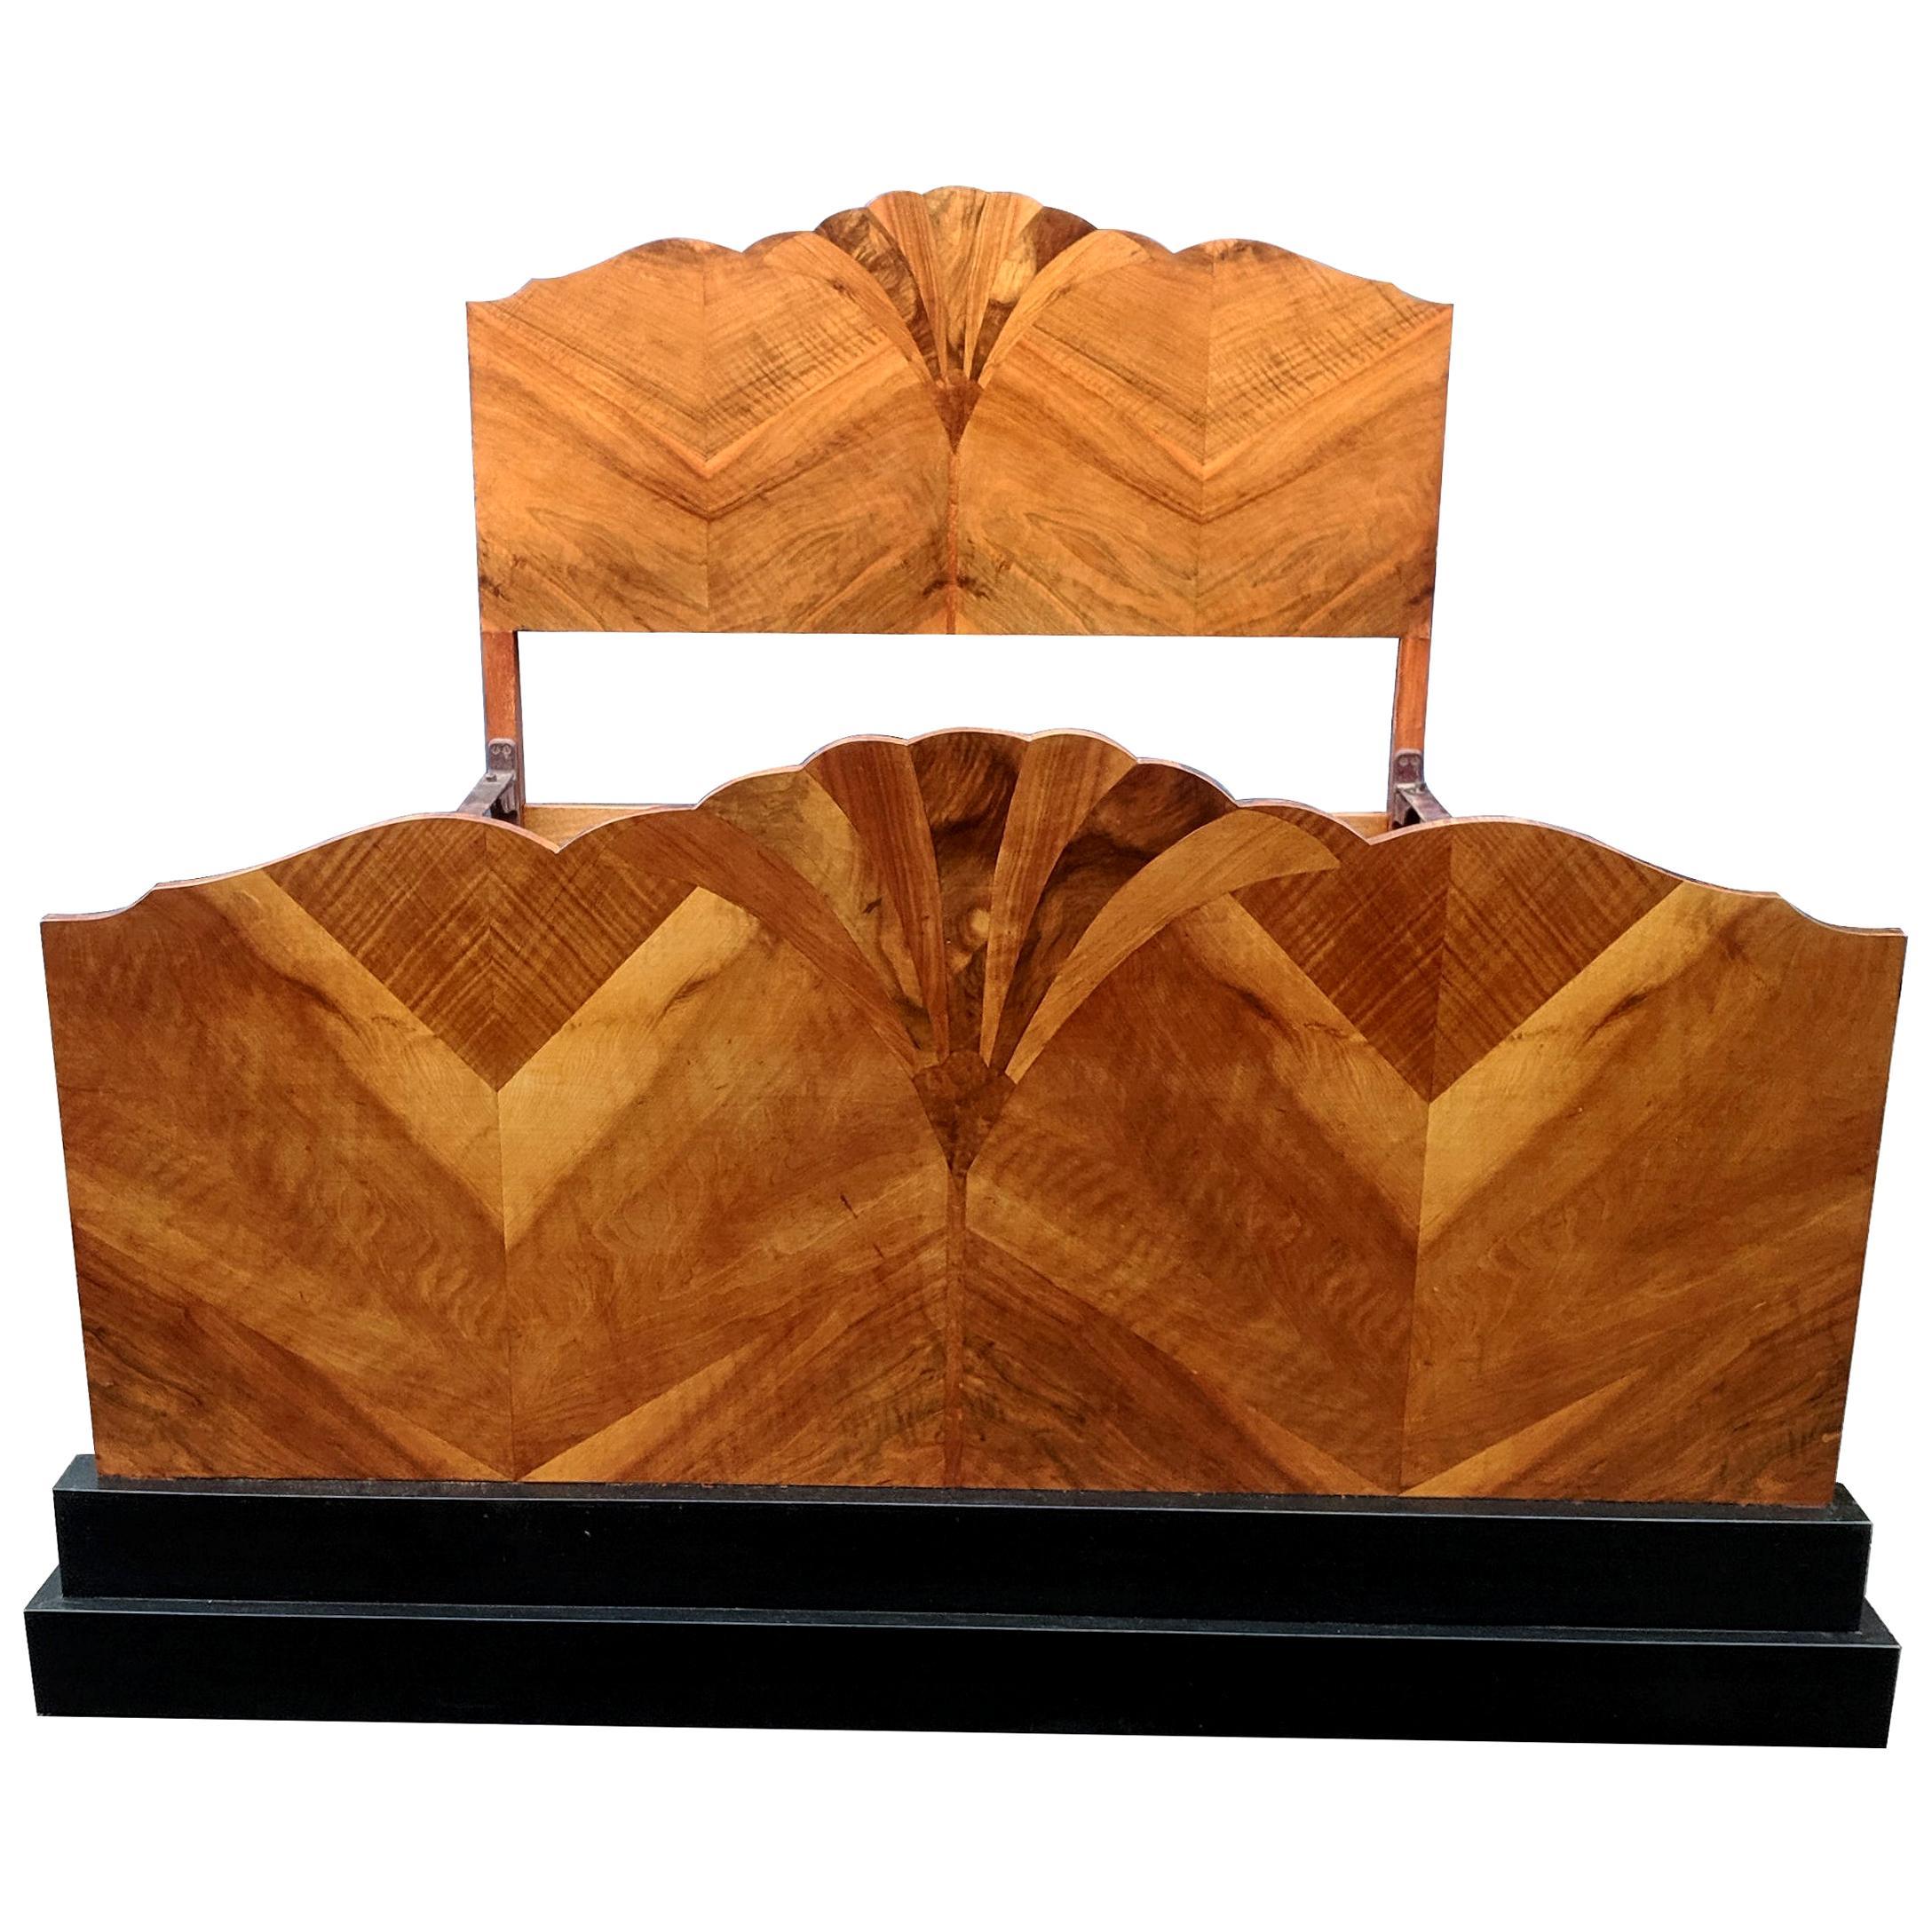 Stunning 1930s Art Deco Walnut Double Bed